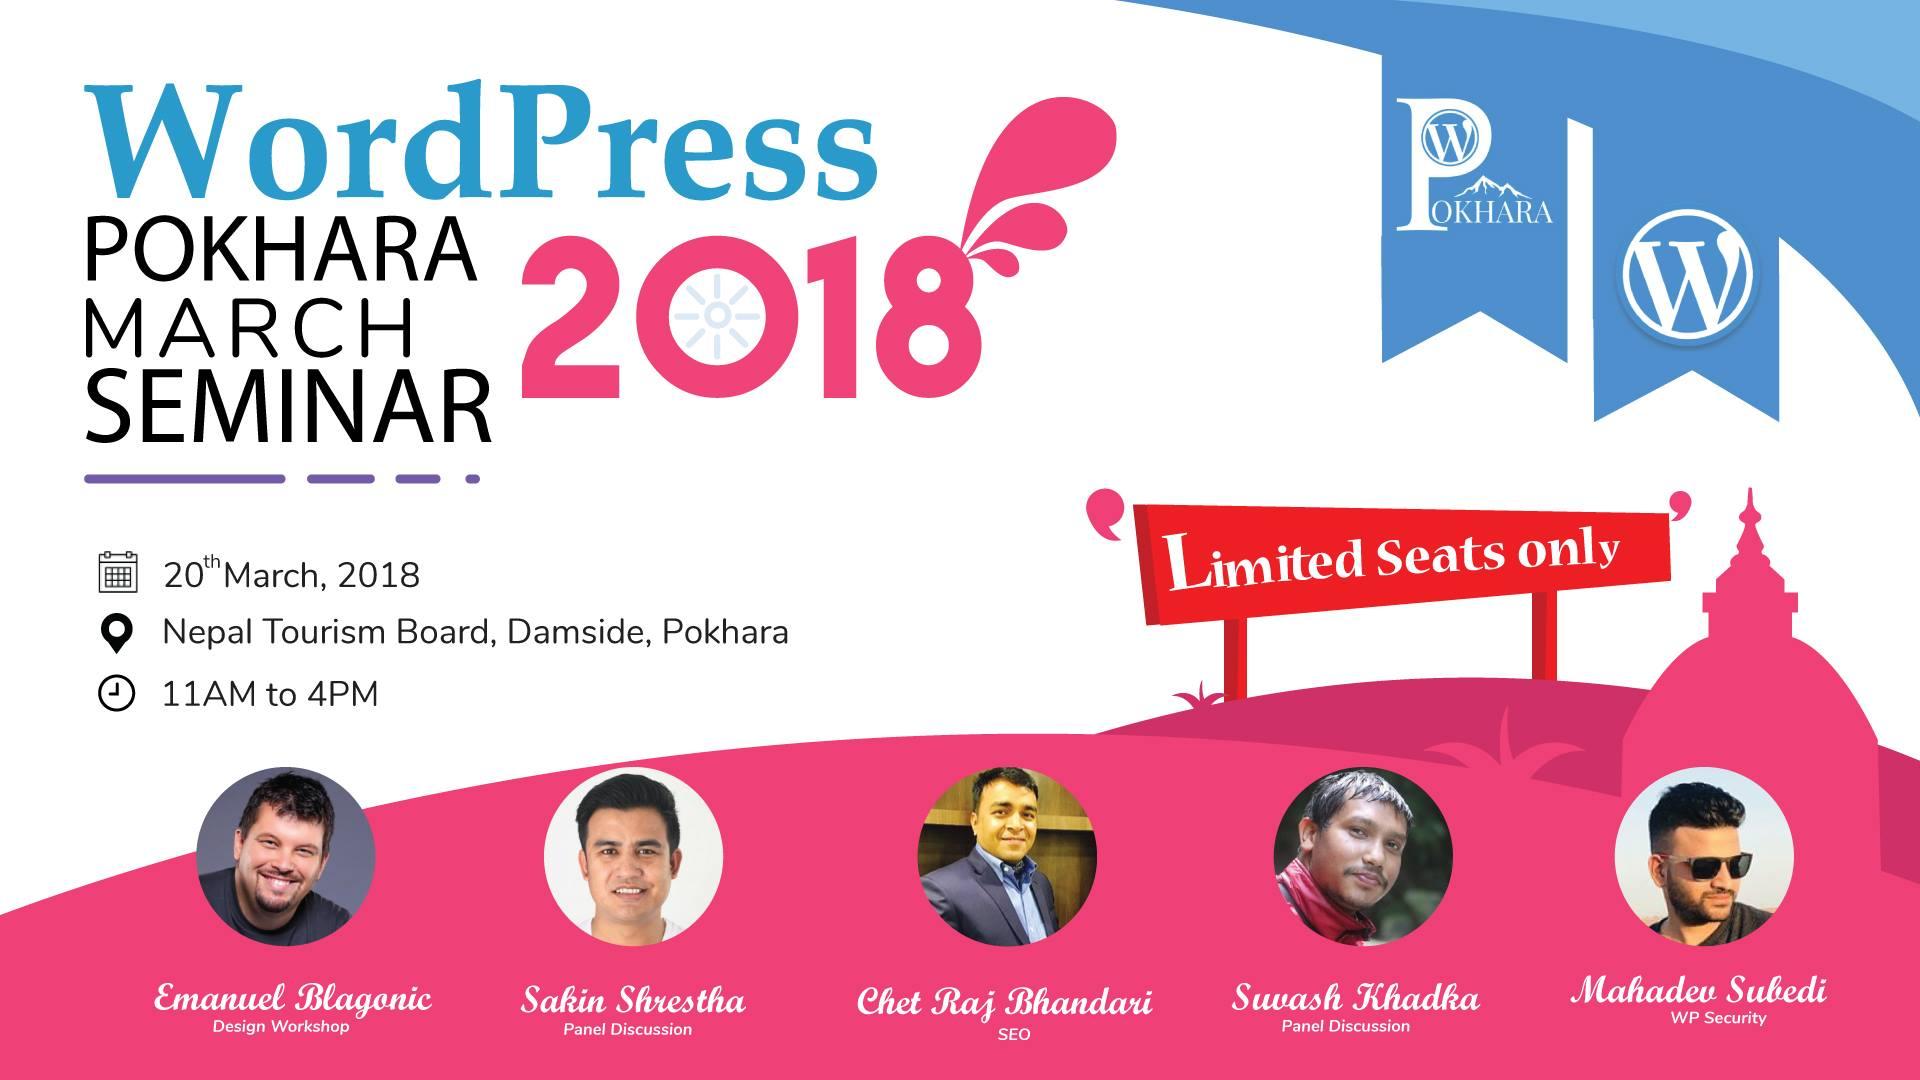 WordPress Pokhara Seminar being organized today!